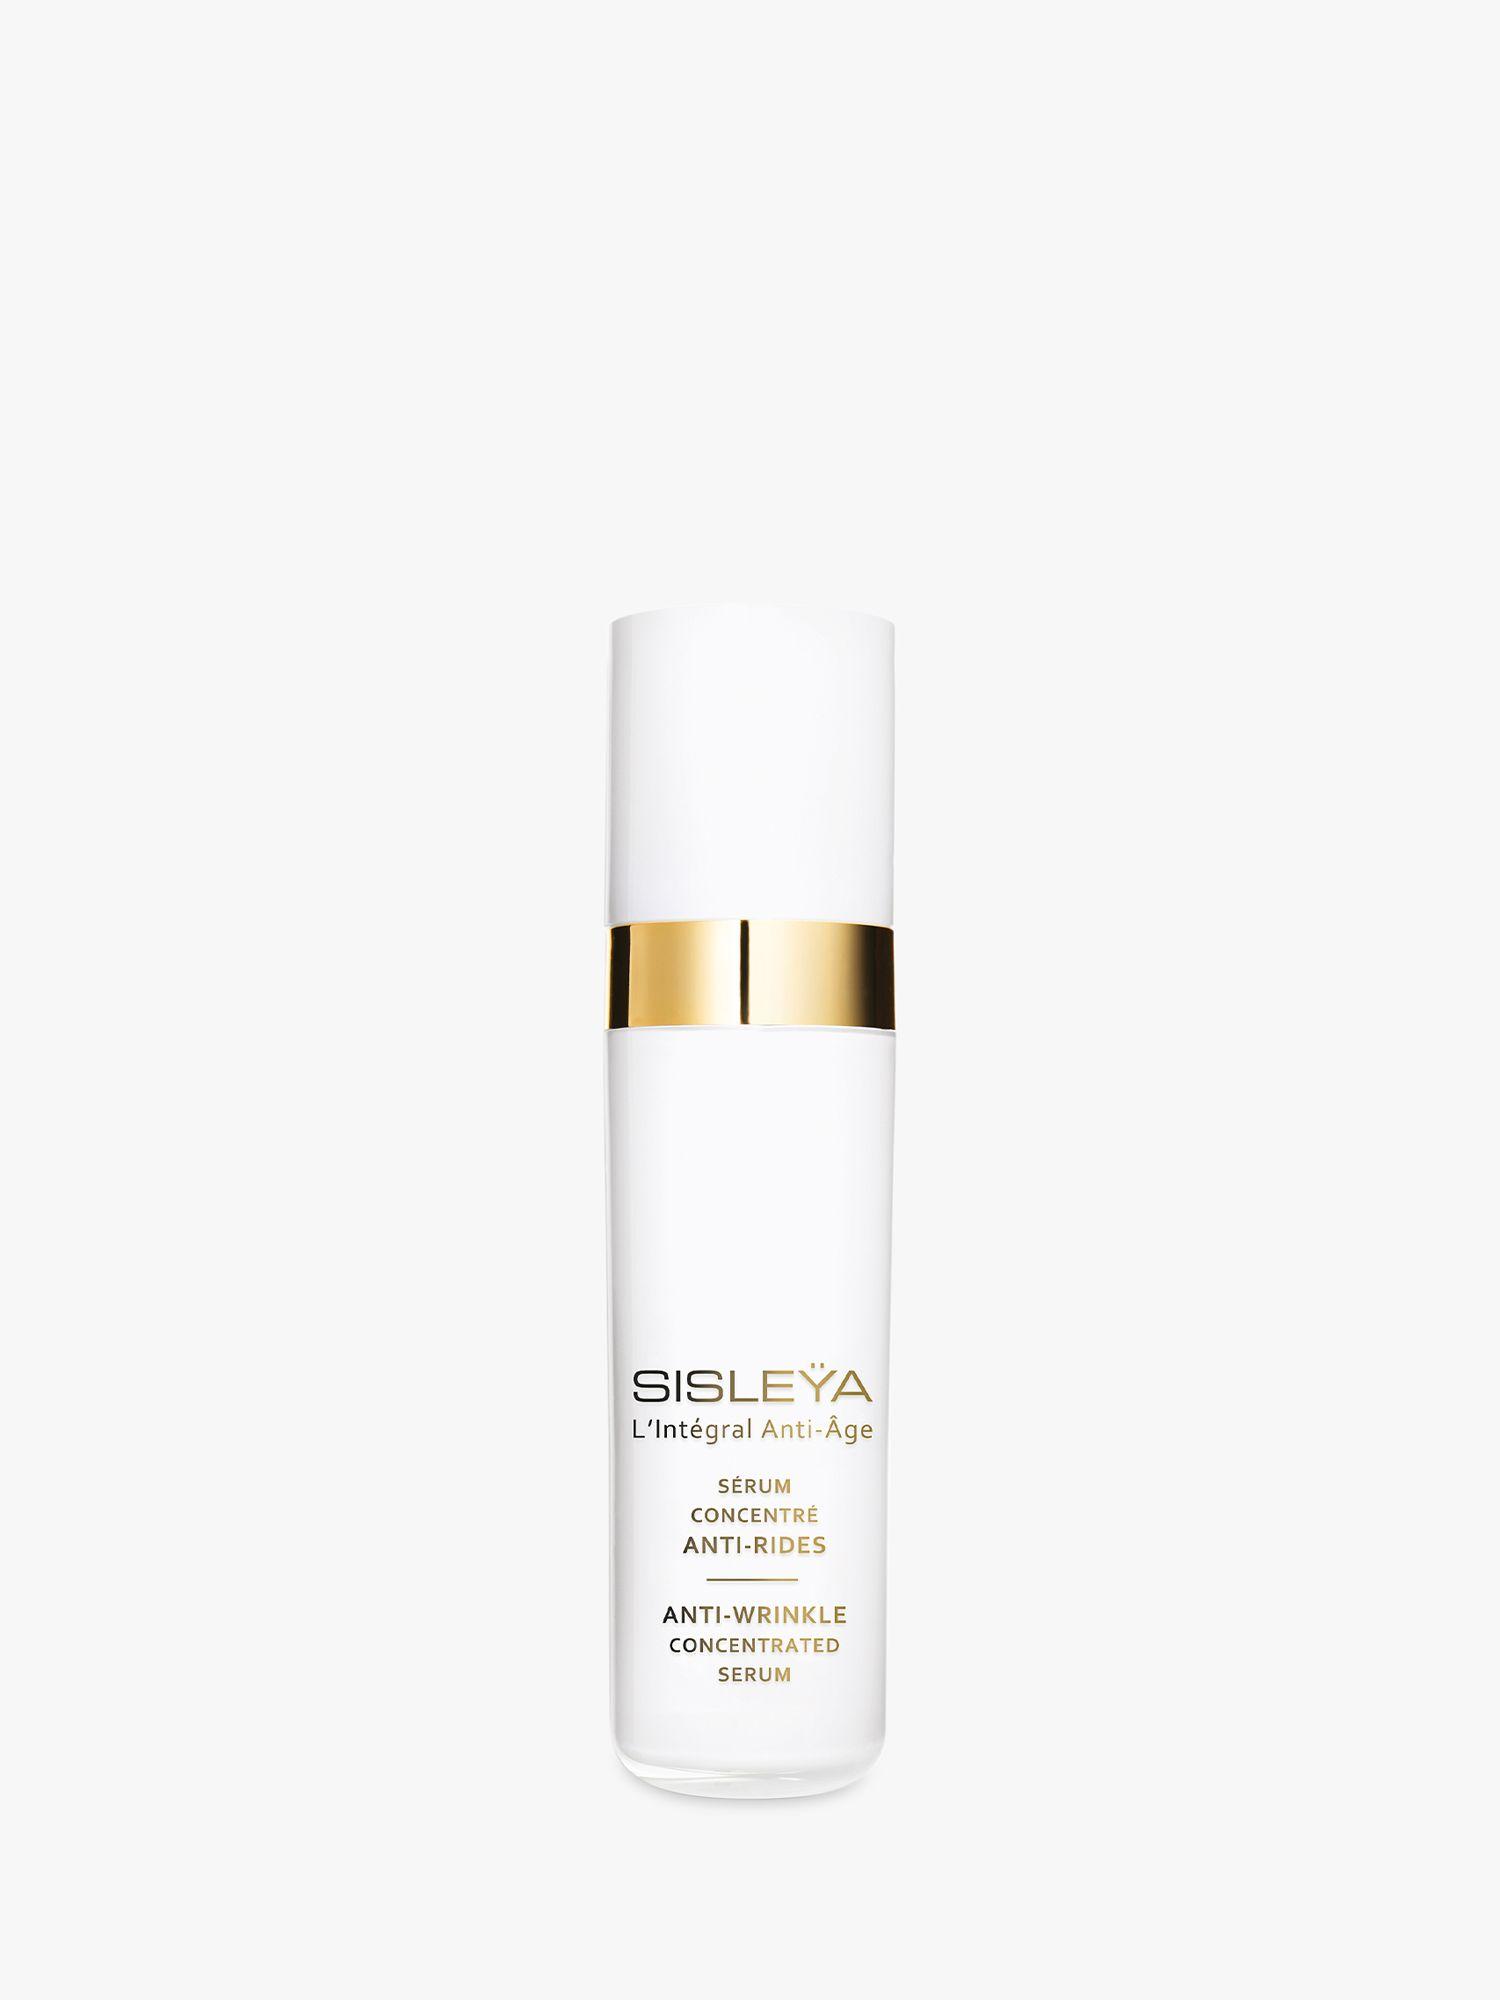 Sisley Sisley Sisleÿa L'Intégral Anti-Âge Anti-Wrinkle Concentrated Serum, 30ml